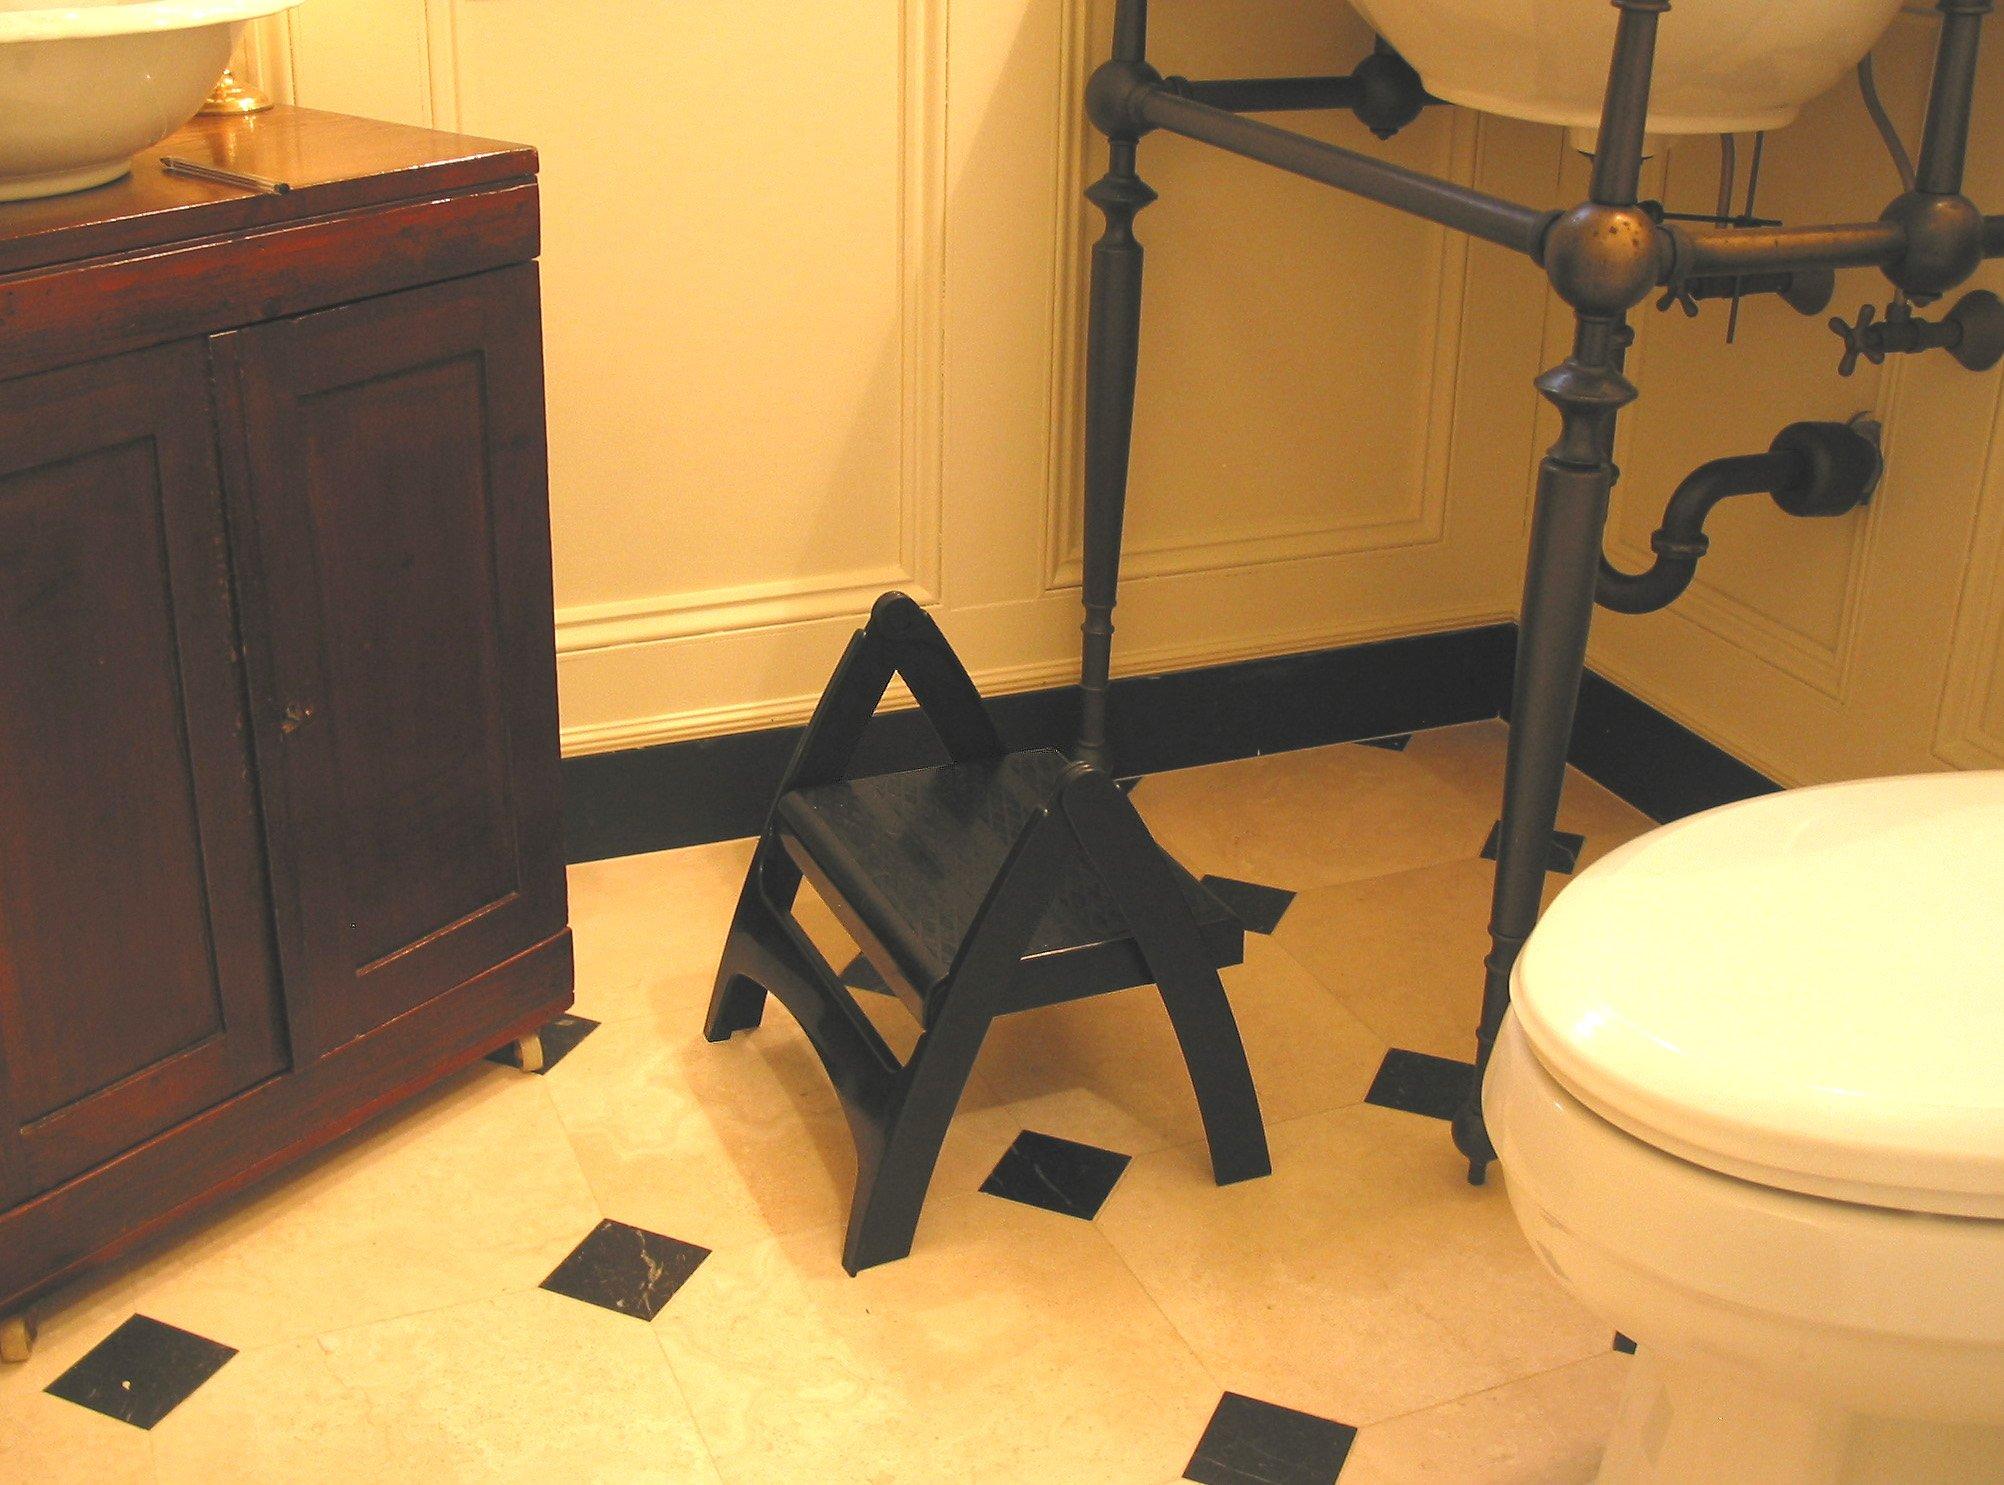 Adams Manufacturing 8530-02-3731 Quik-Fold Step Stool, Black